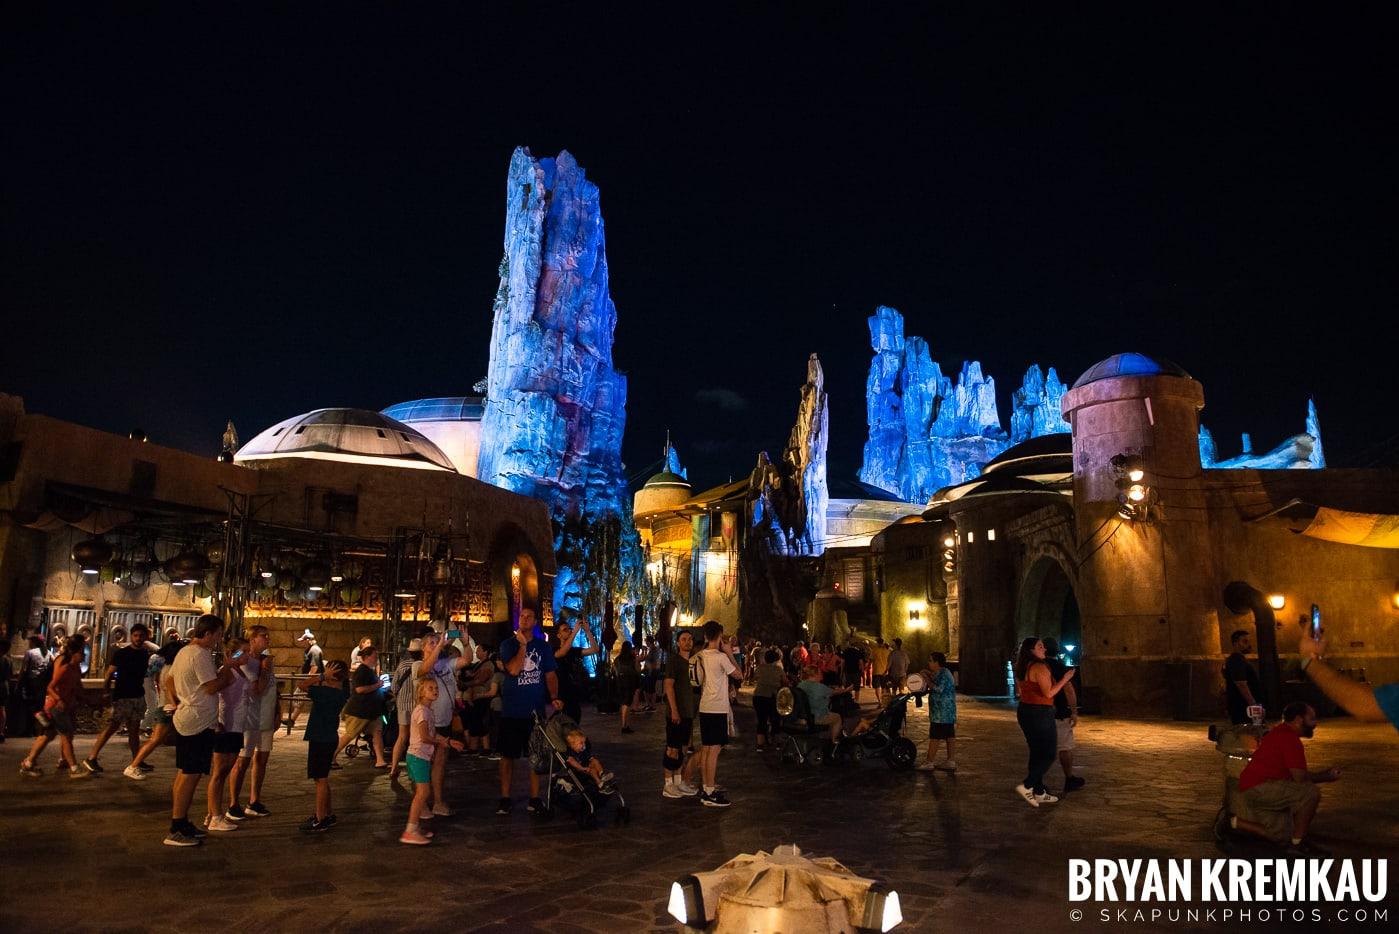 Walt Disney World Vacation: Day 6 (Magic Kingdom, Epcot, Disney's Hollywood Studios) - 10.4.19 (6)